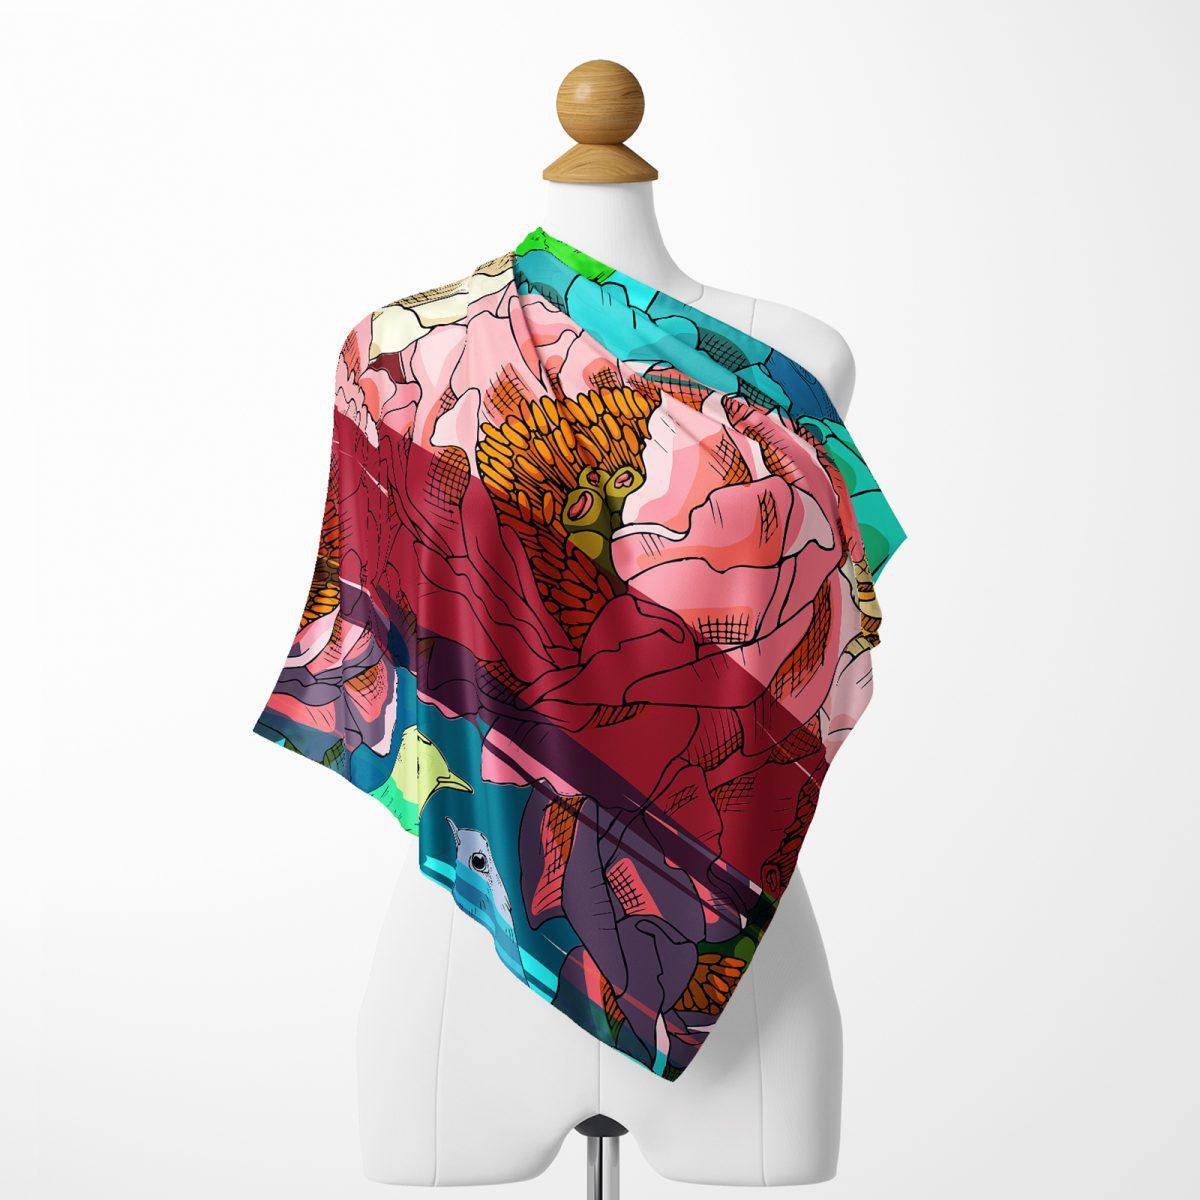 Realhomes Kuş motifli Dijital Baskılı Modern Tivil Eşarp Realhomes